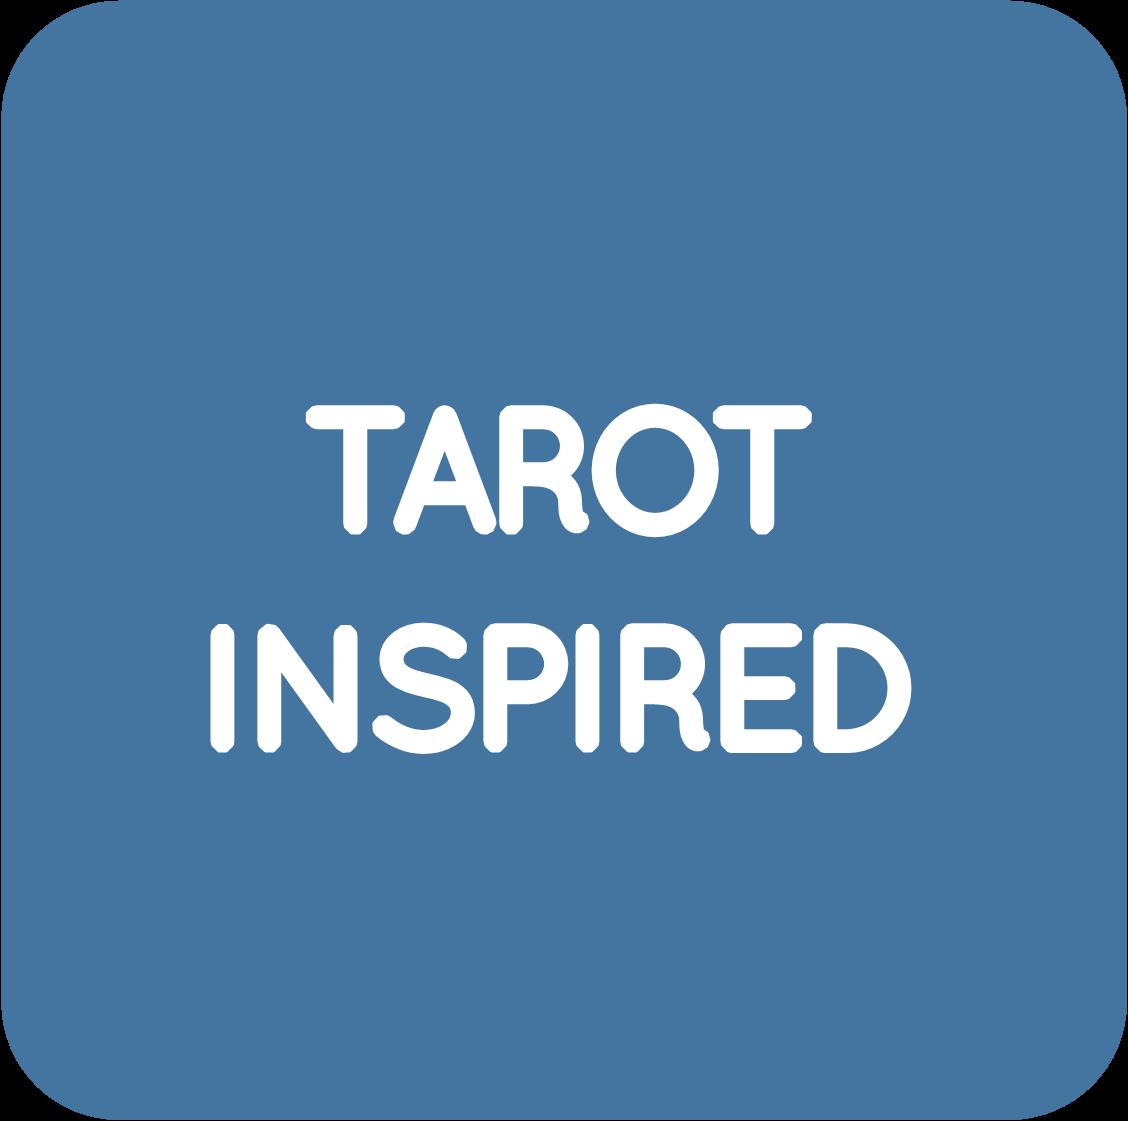 00-TAROT INSPIRED.png